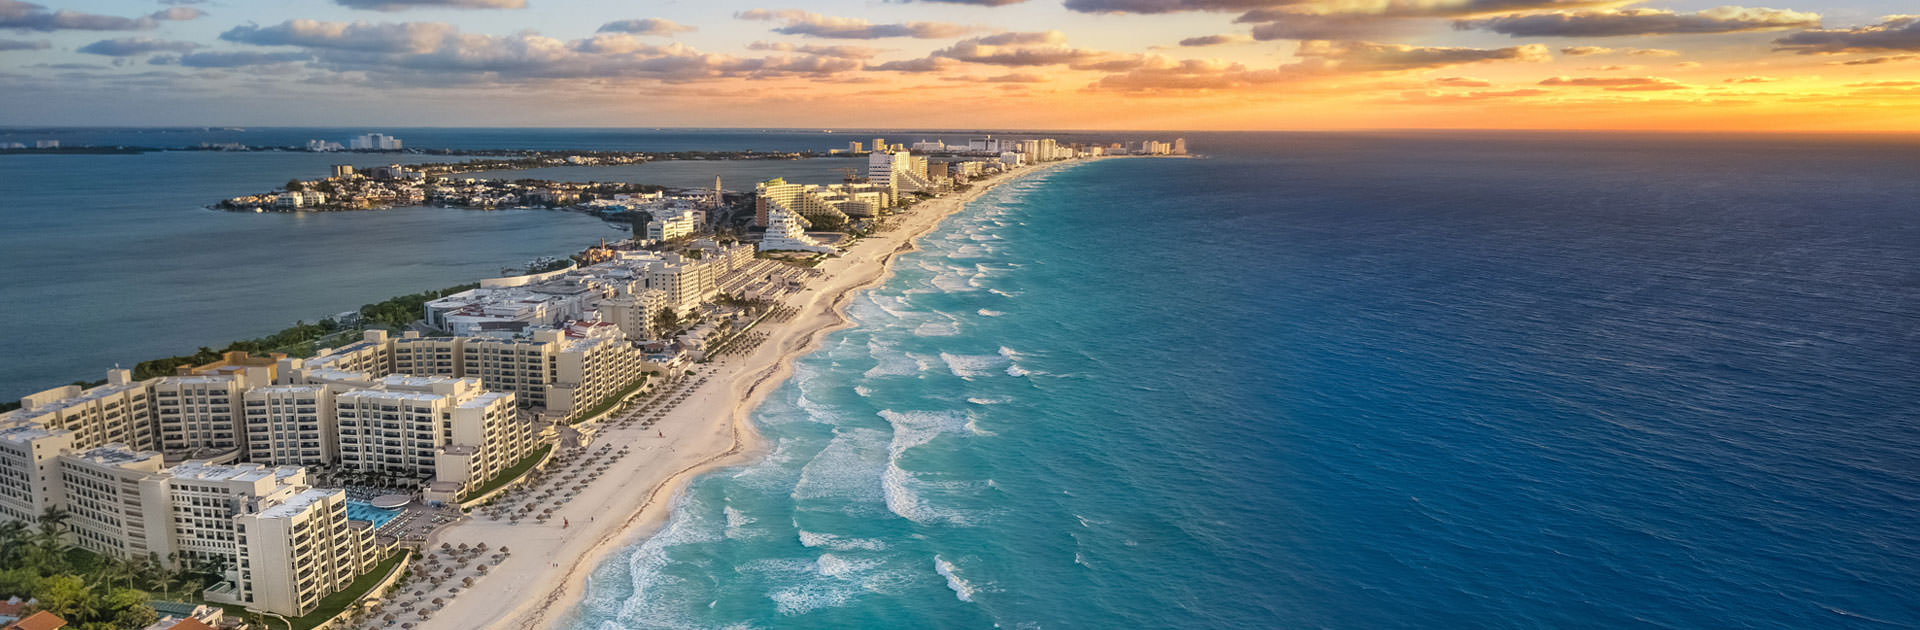 Cancun - destination photo